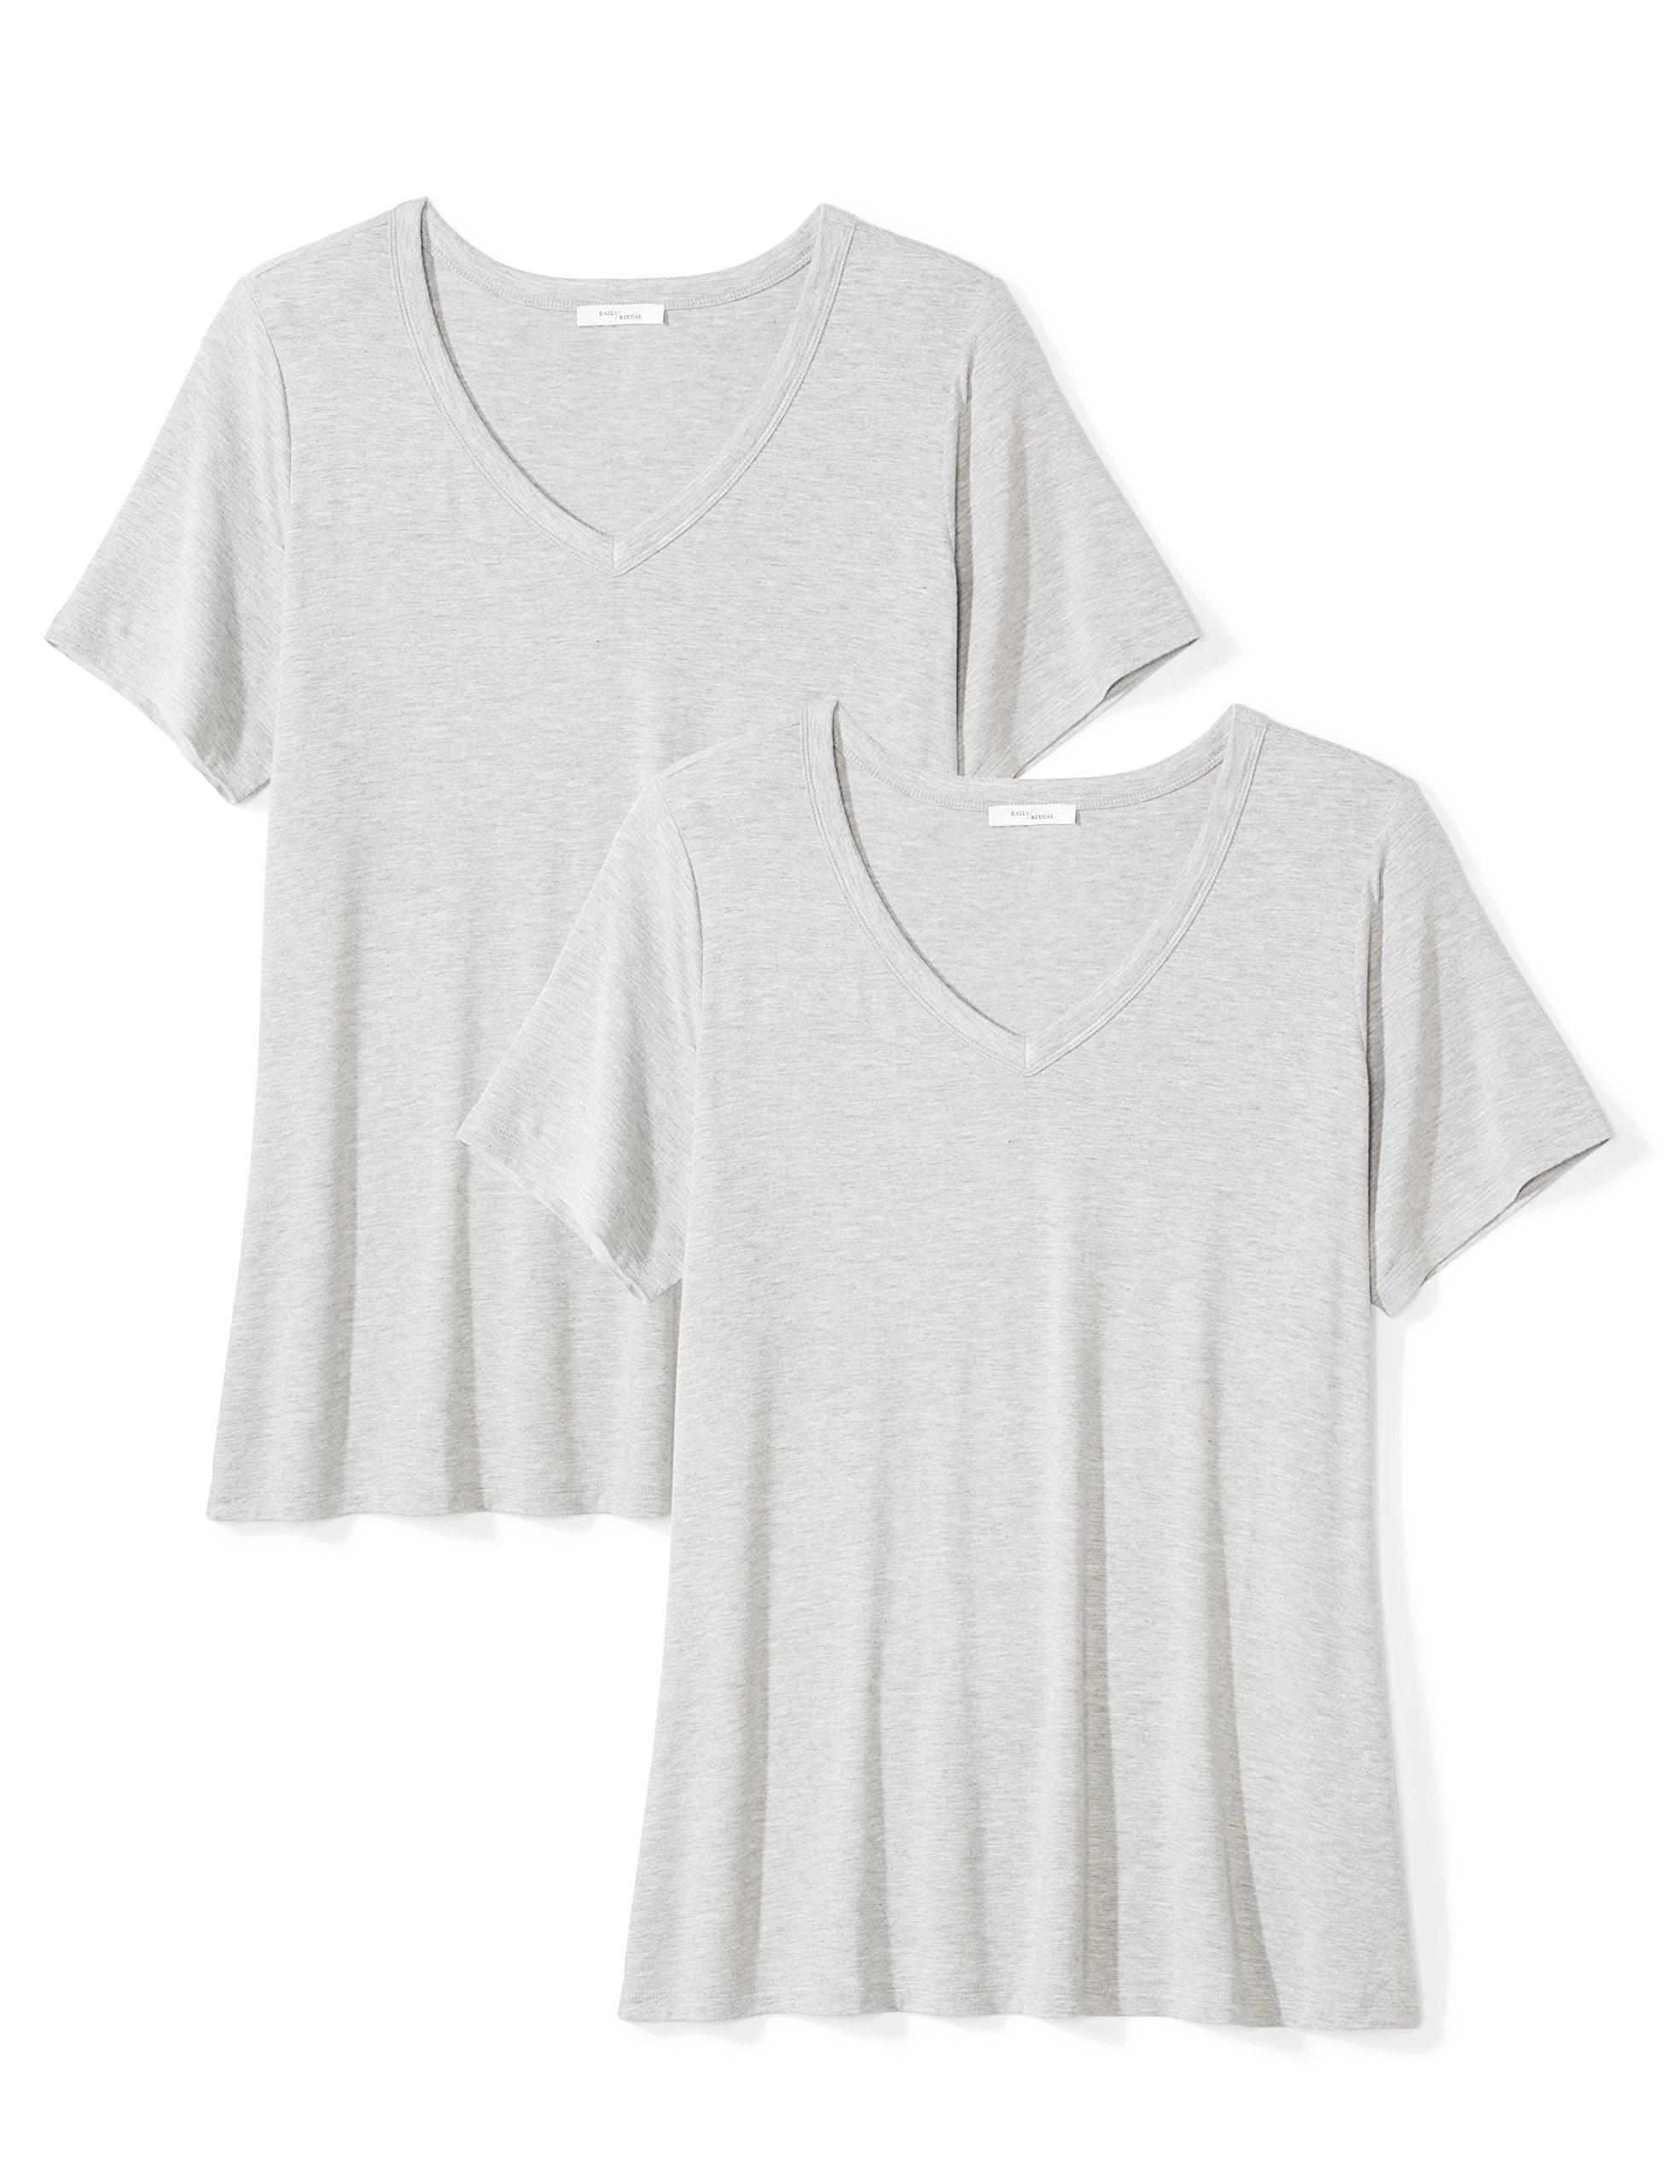 Daily Ritual Women's Plus Size Jersey Short-Sleeve V-Neck T-Shirt, 2-Pack, Light Heather Grey/Light Heather Grey, 2X